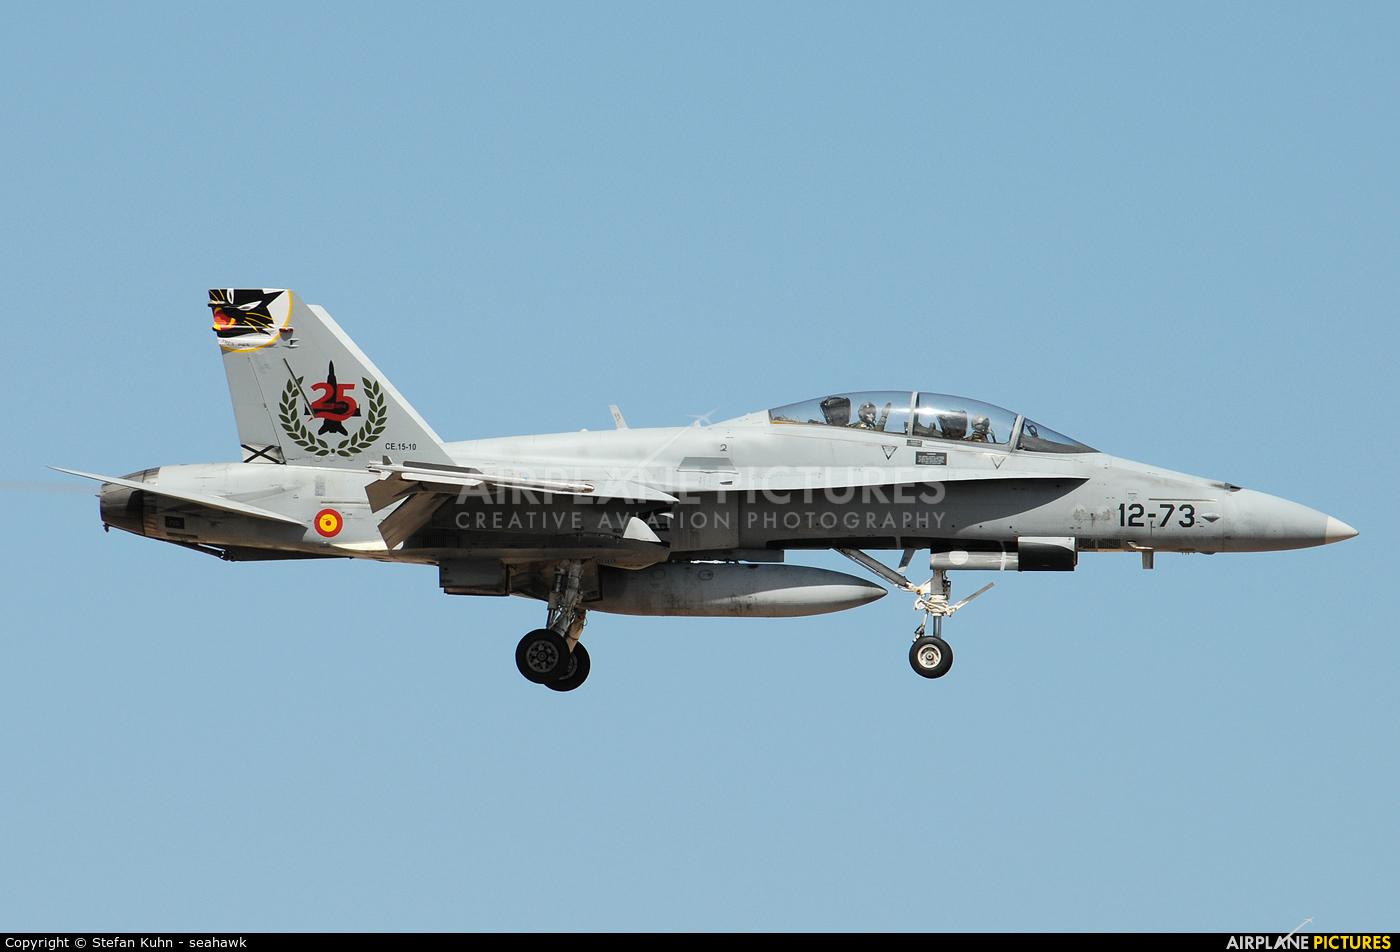 Spain - Air Force CE.15-10 aircraft at Las Palmas de Gran Canaria